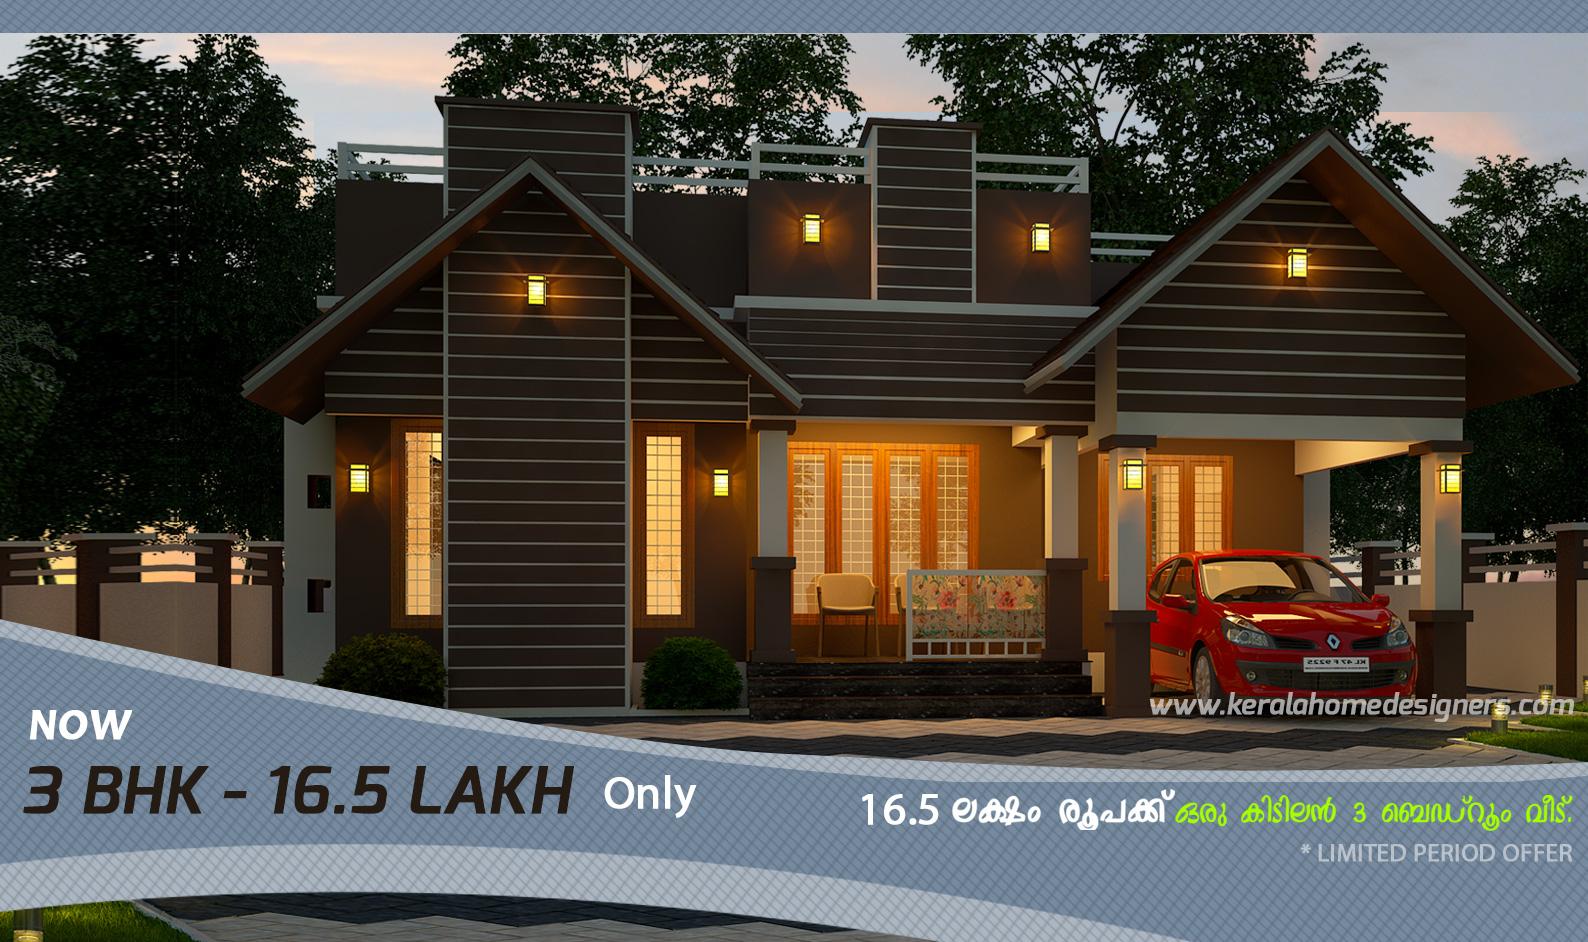 3bhk Low Budget Homes In Kerala